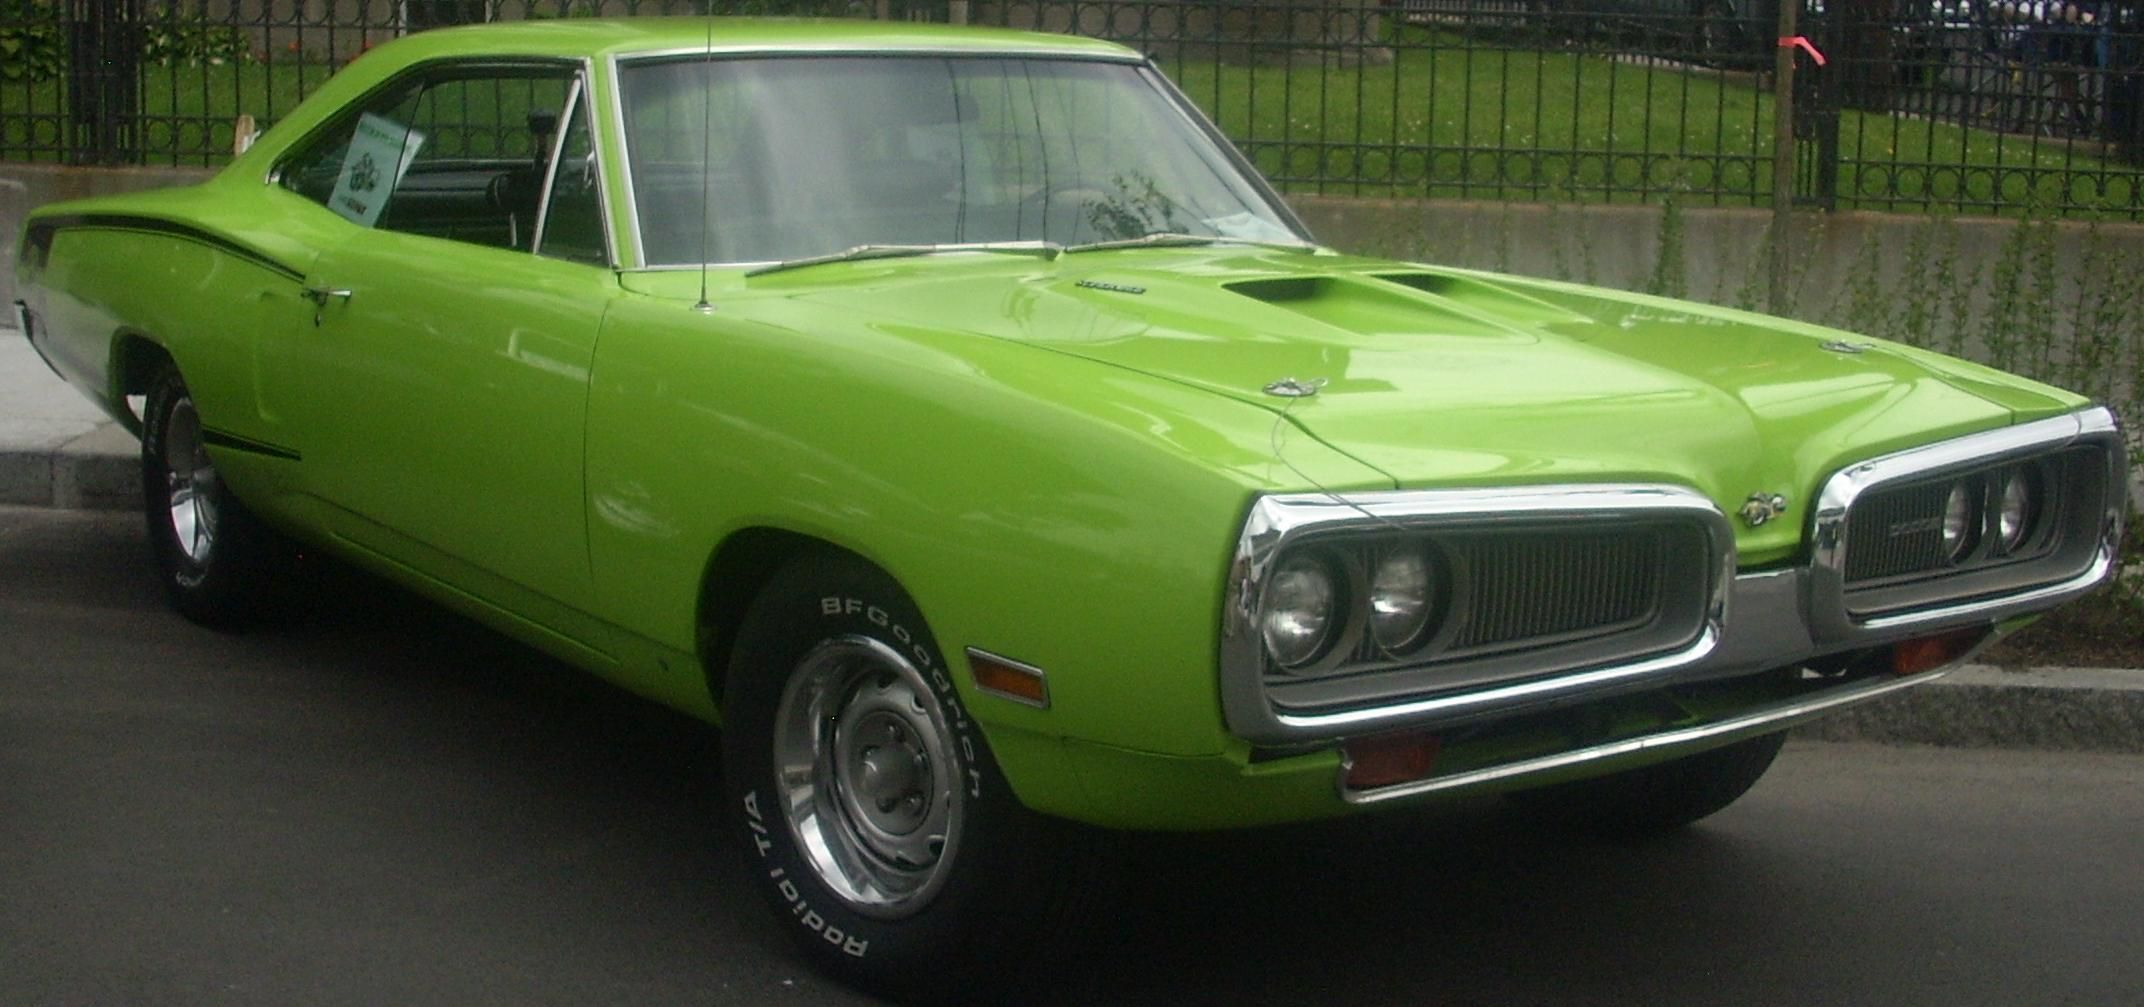 Classic Mopar Cars | Classic Muscle Car | Classic Chrysler Cars ...